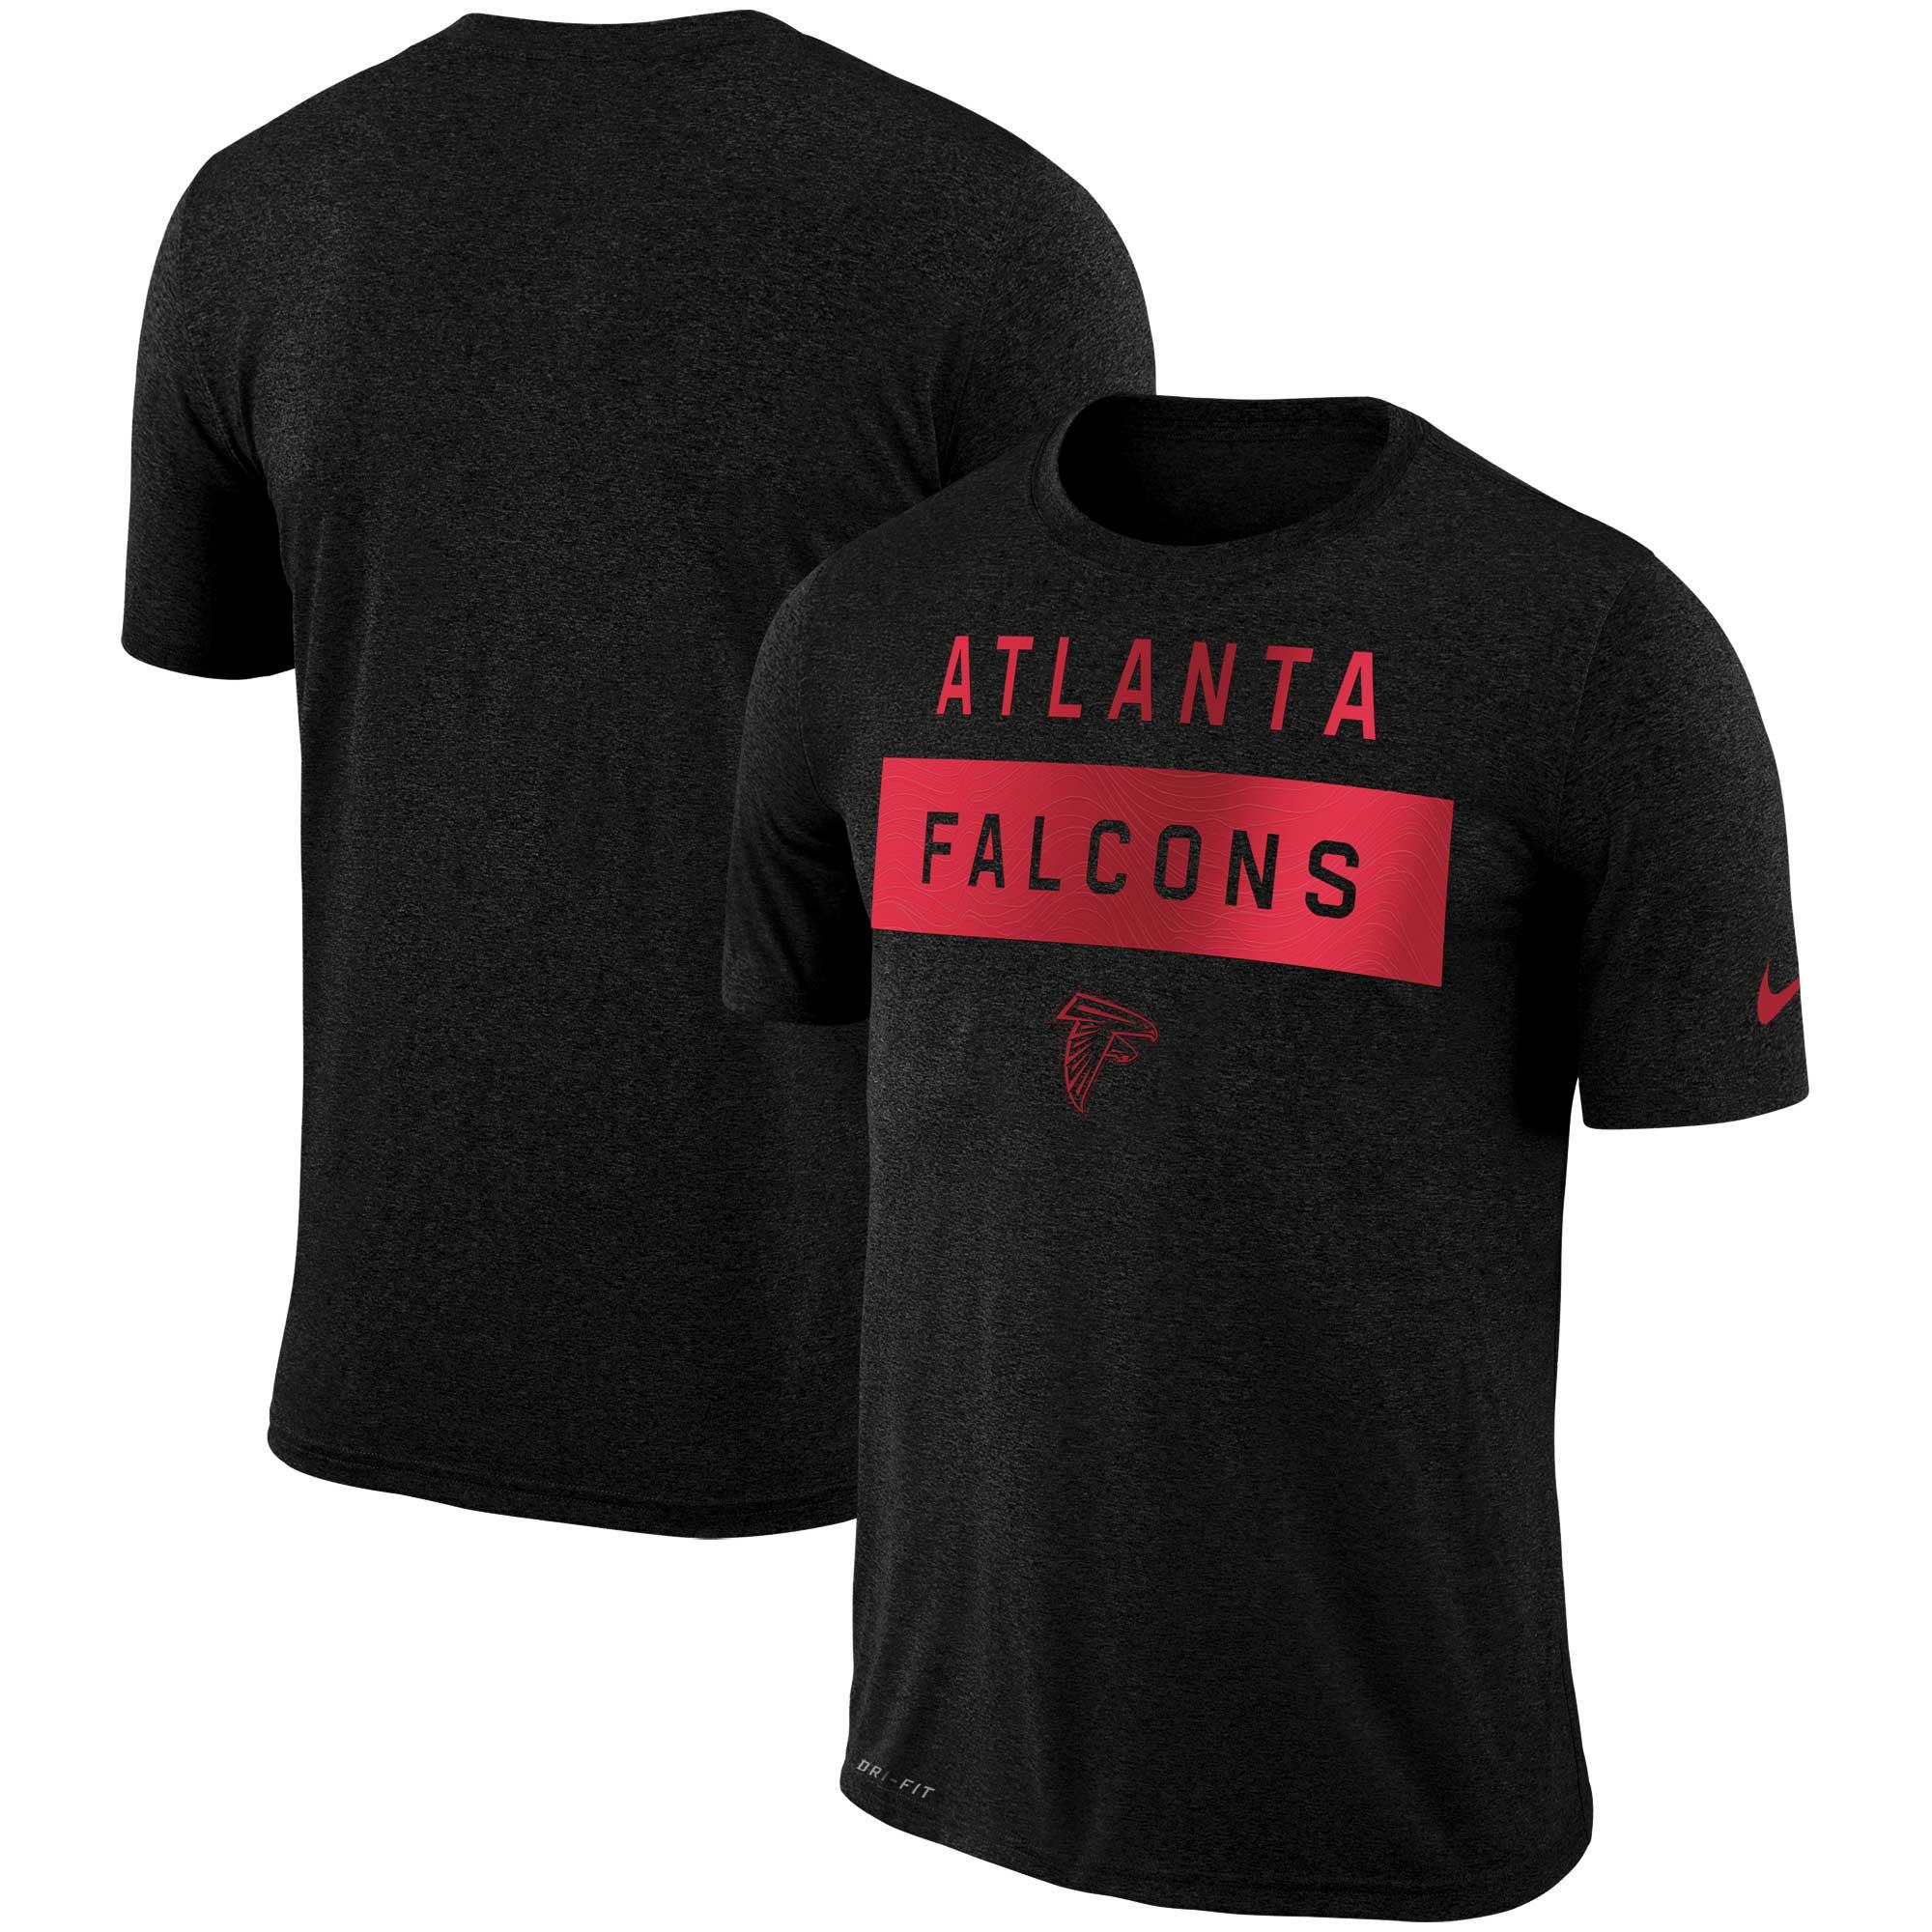 Atlanta Falcons Nike Sideline Legend Lift Performance T-Shirt - Black